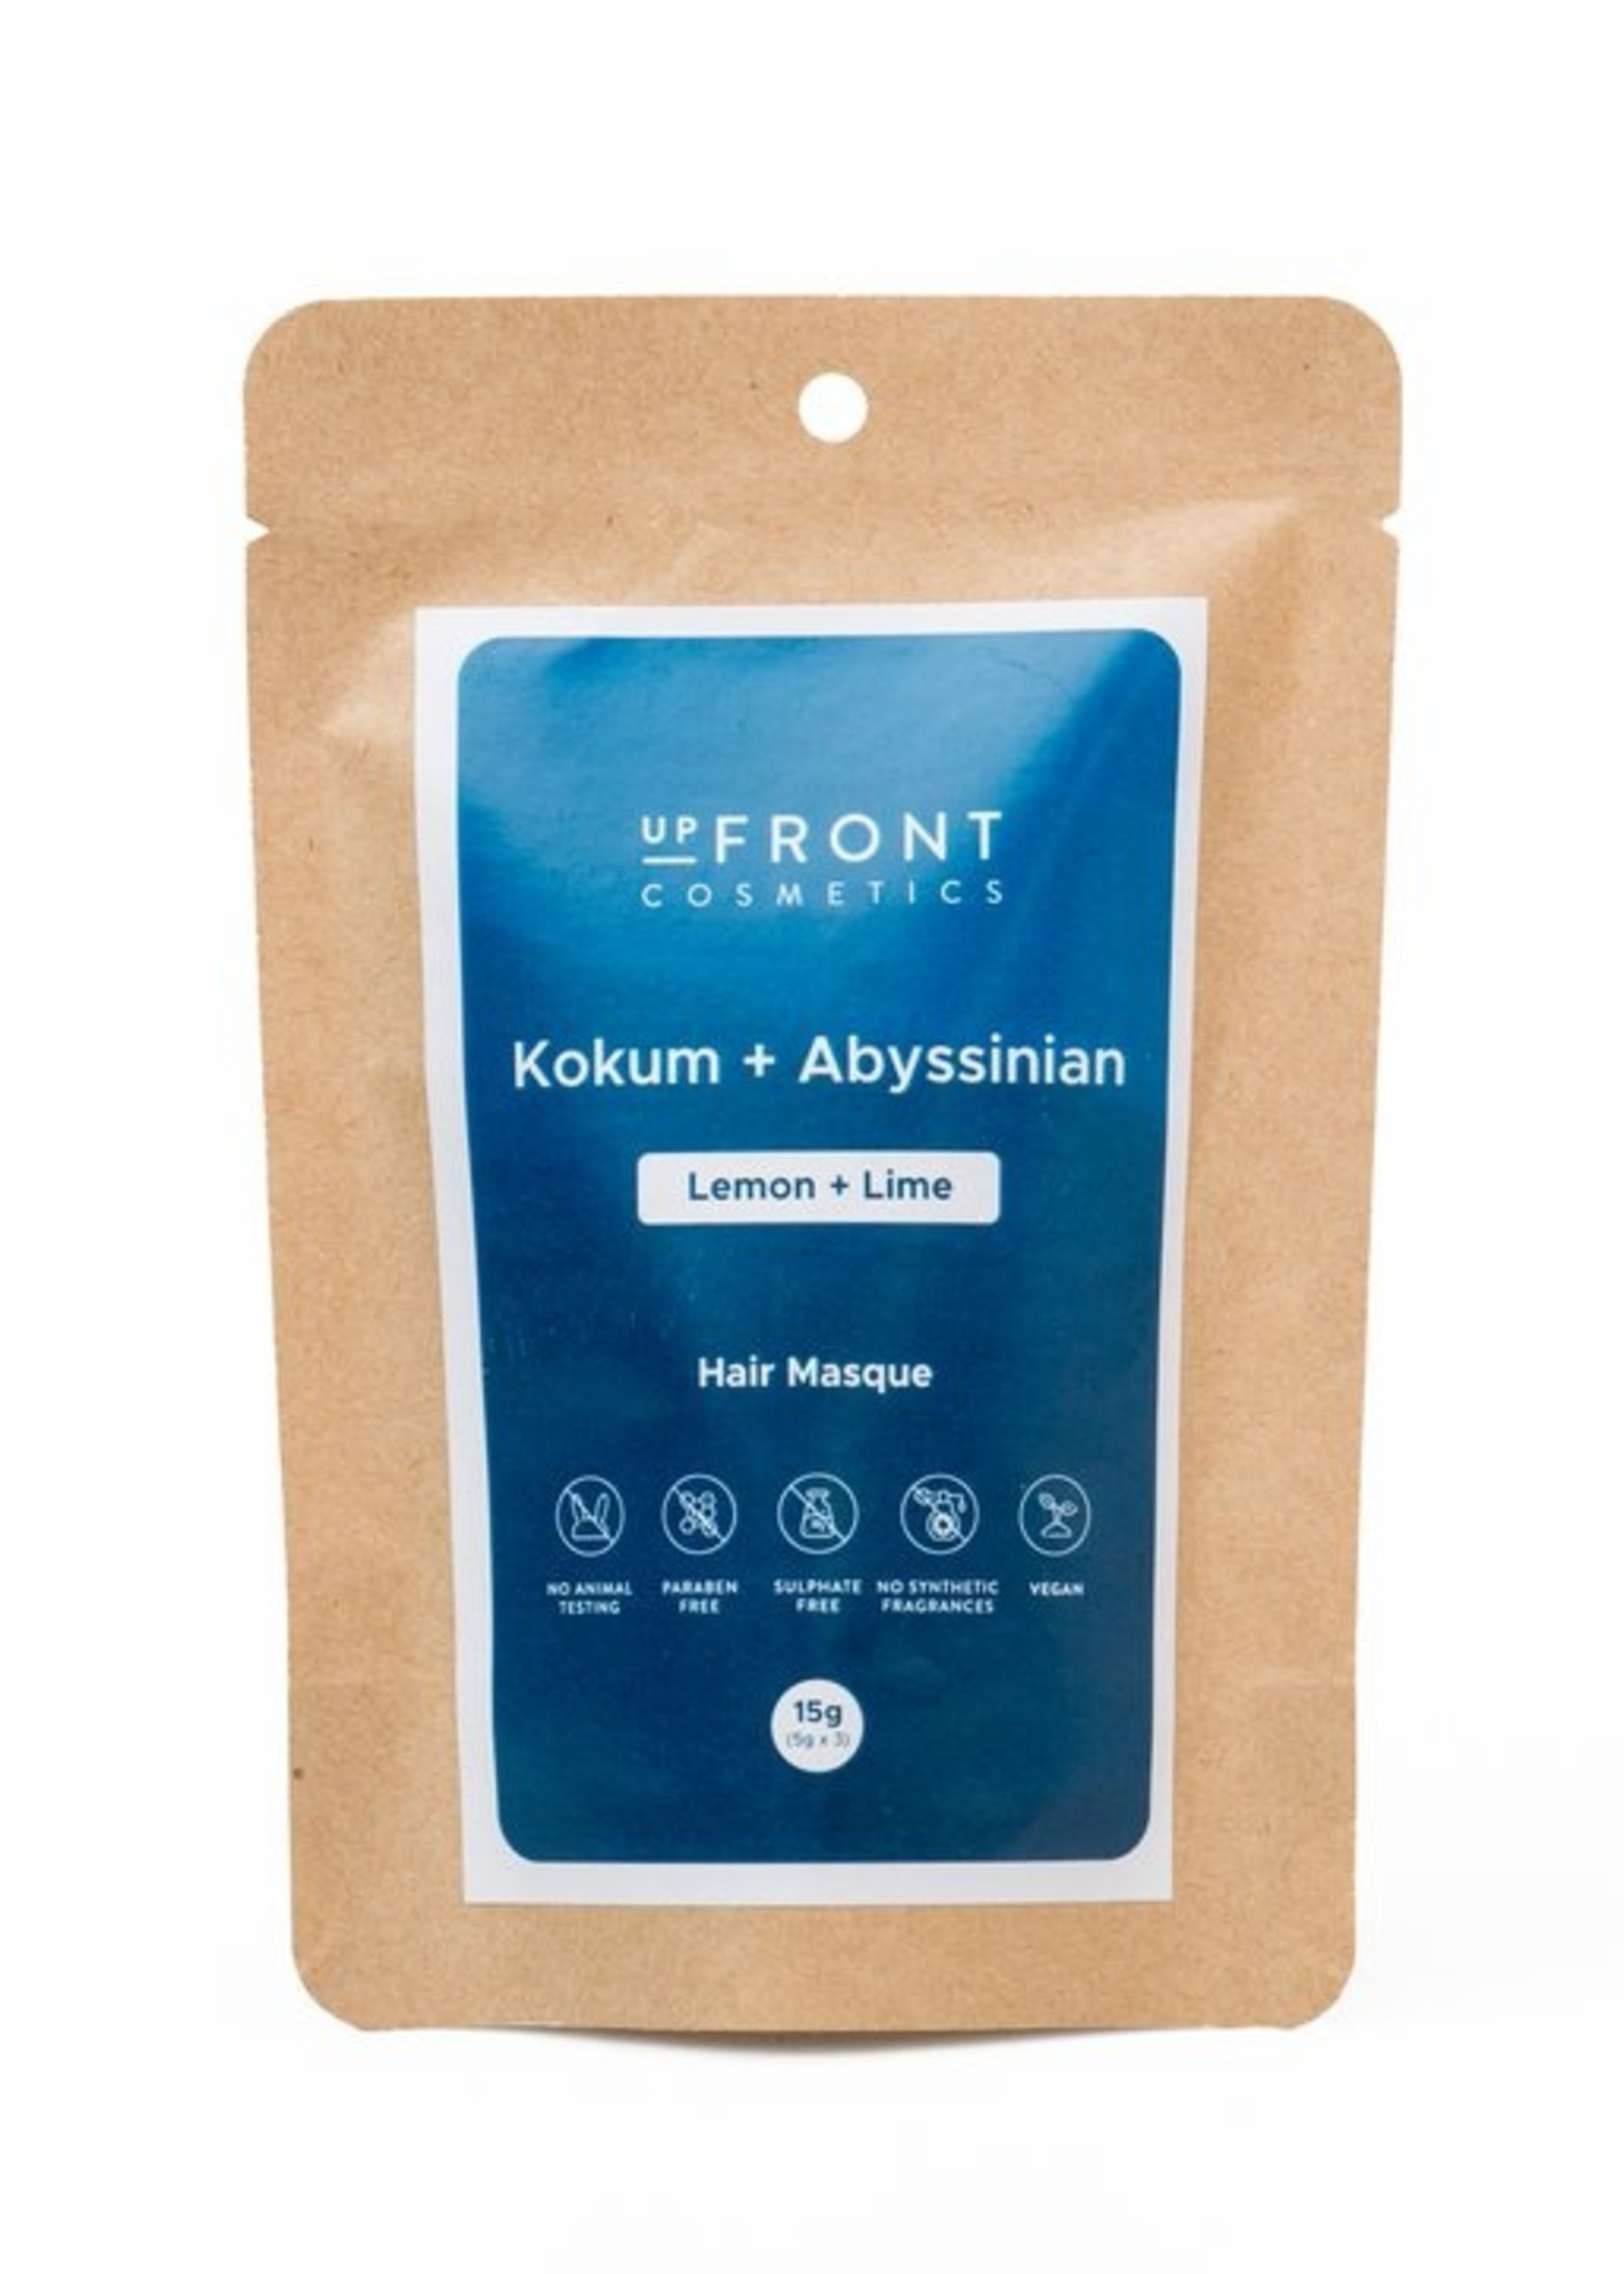 Upfront Cosmetics Kokum + Abyssinian Hair Masque